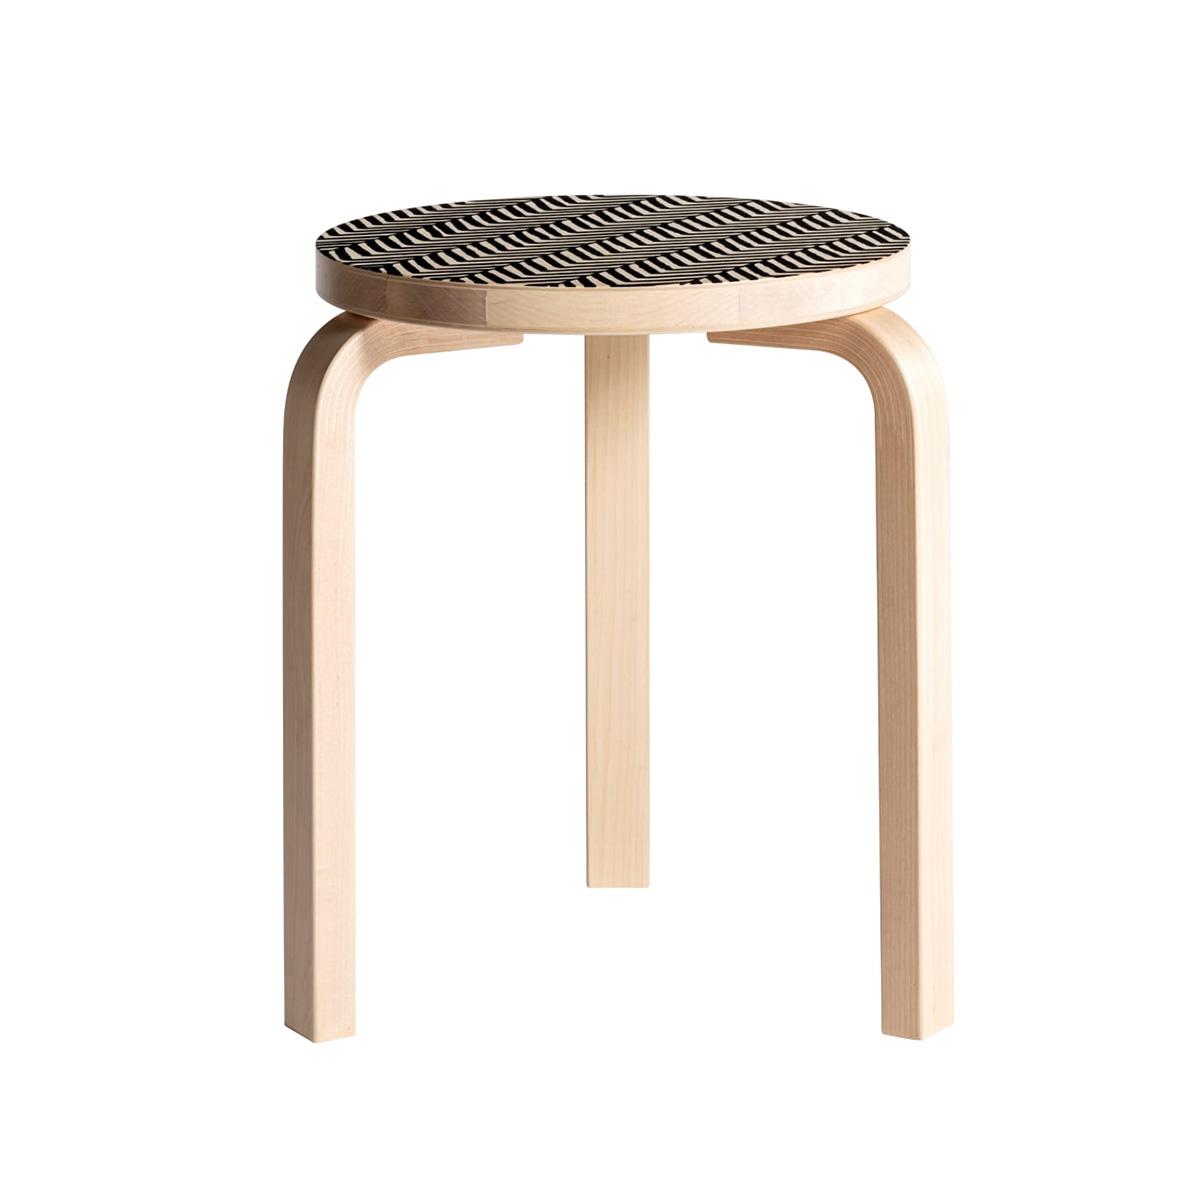 02-aalto-stool-60-100-objetos-finlandia